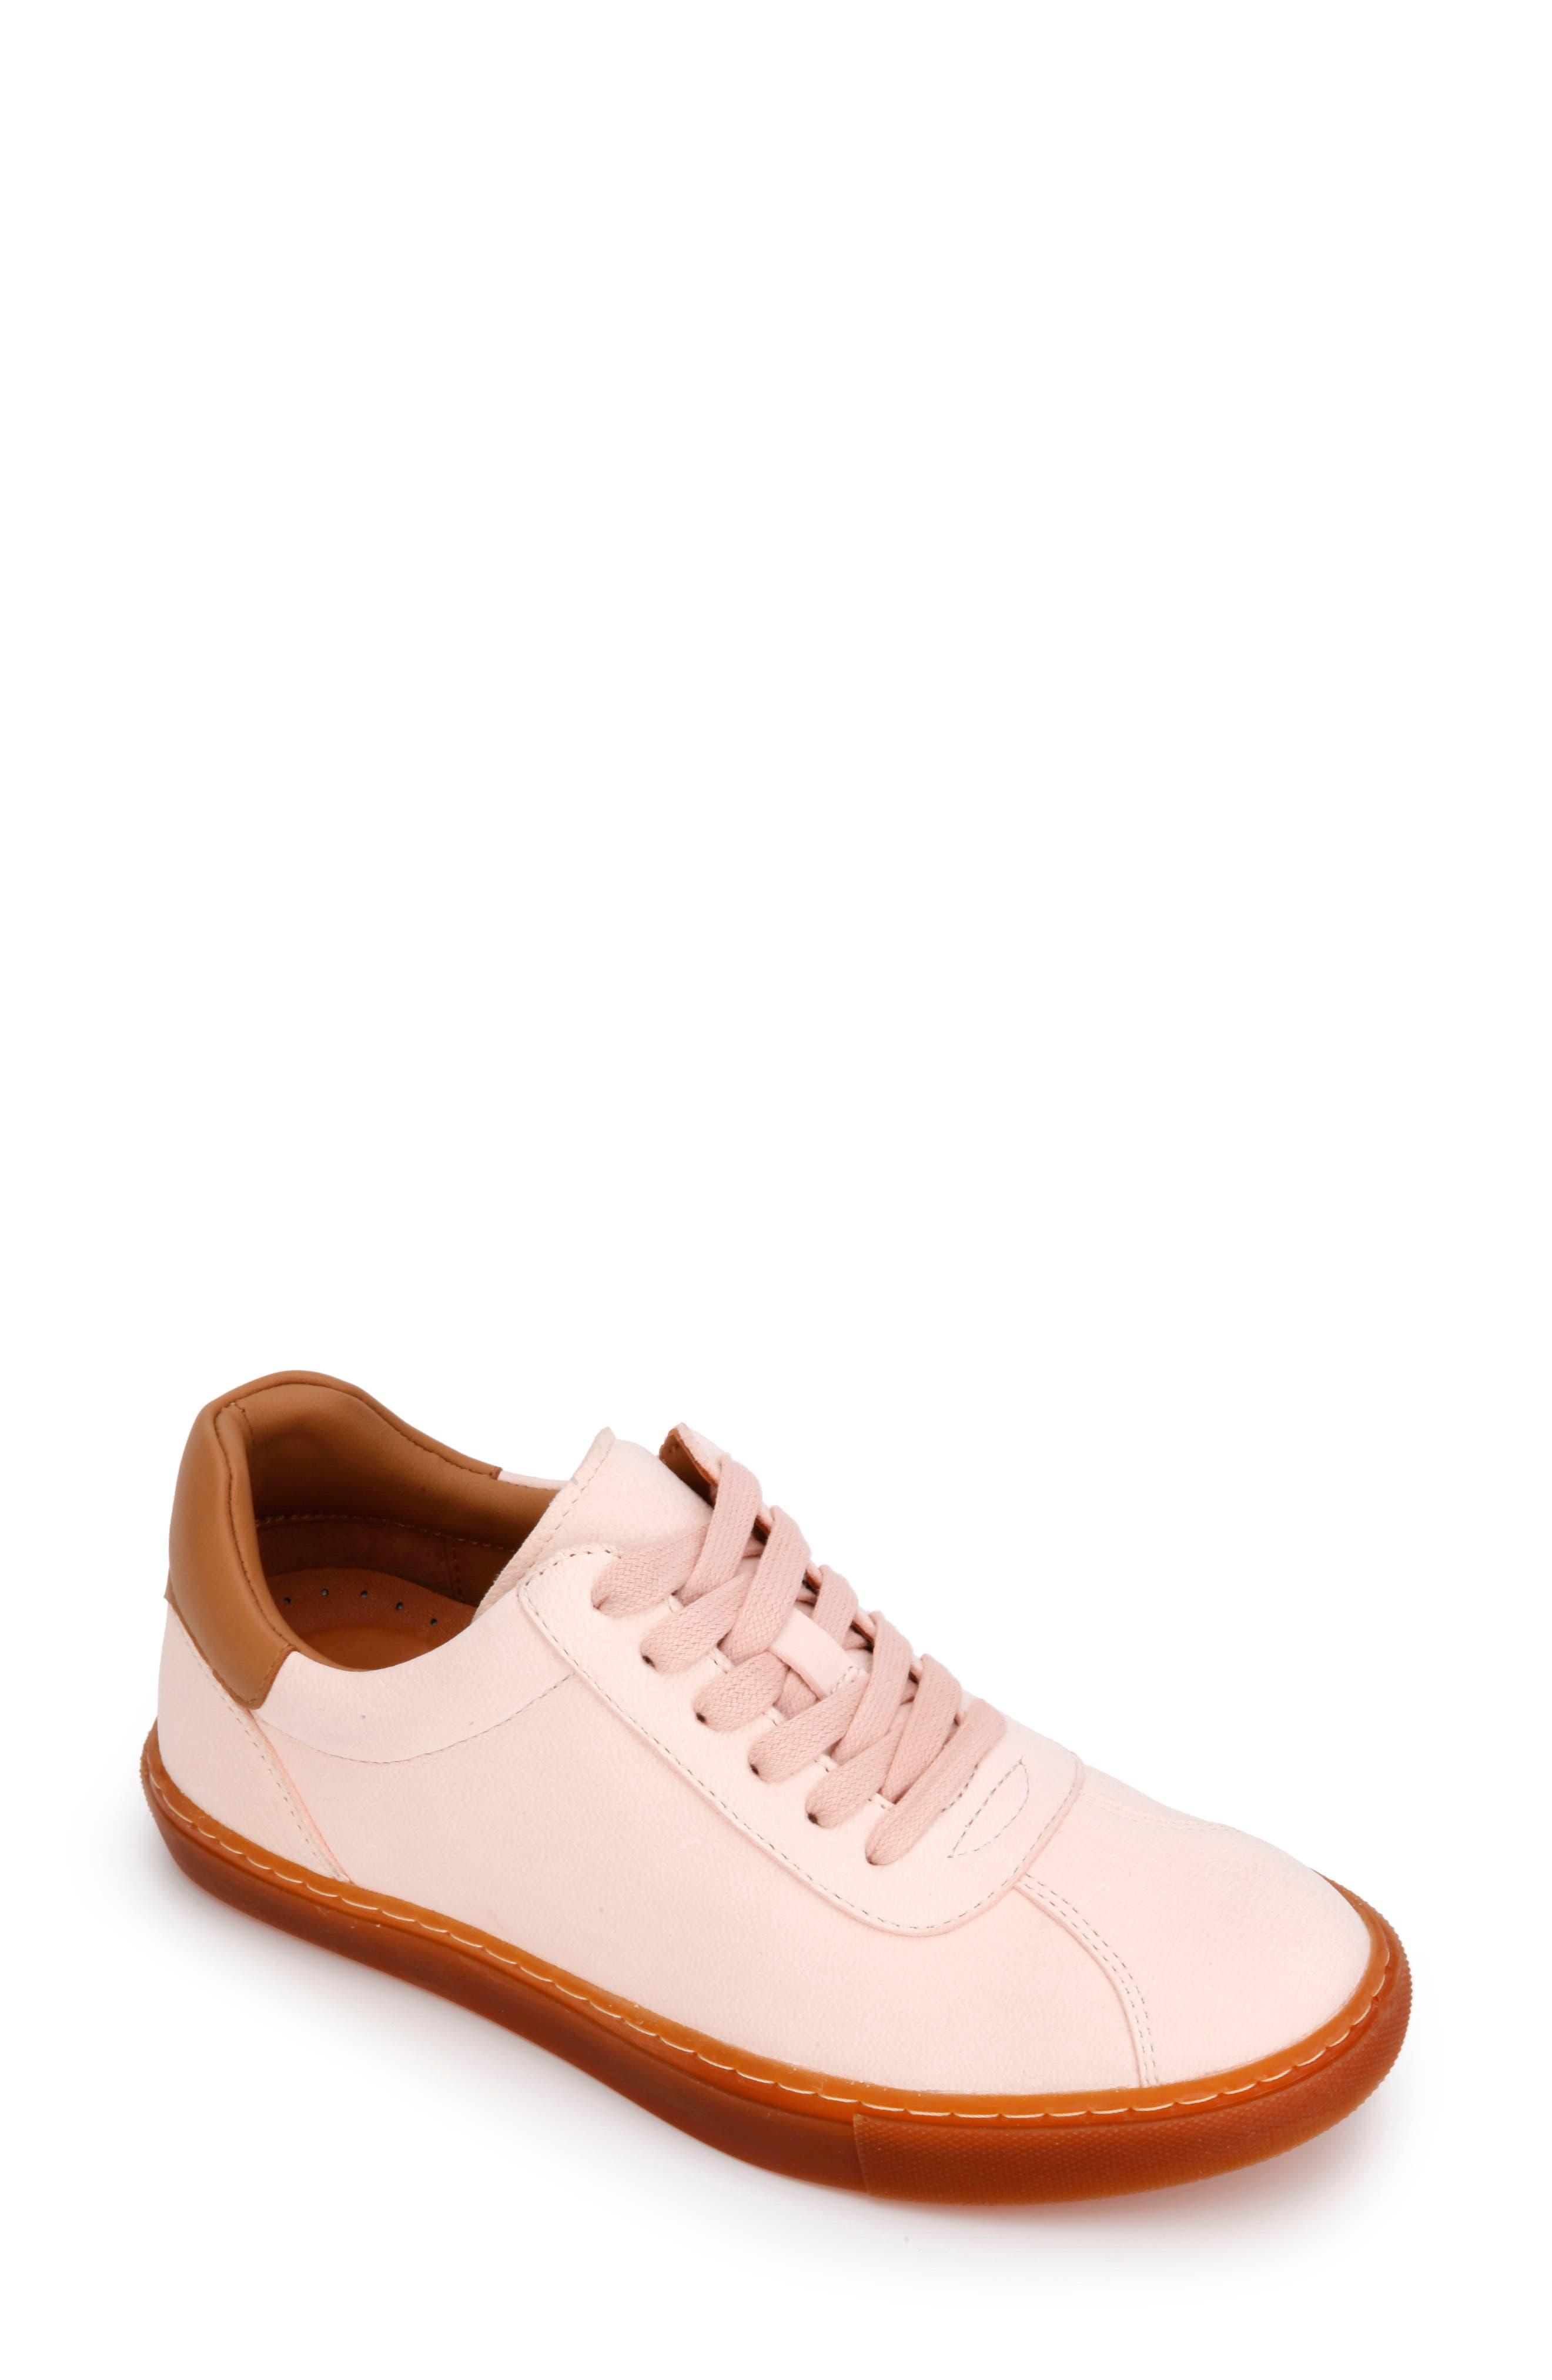 Gentle Souls Femme Raina Lite SPORTY sneaker-Choisir sz//couleur